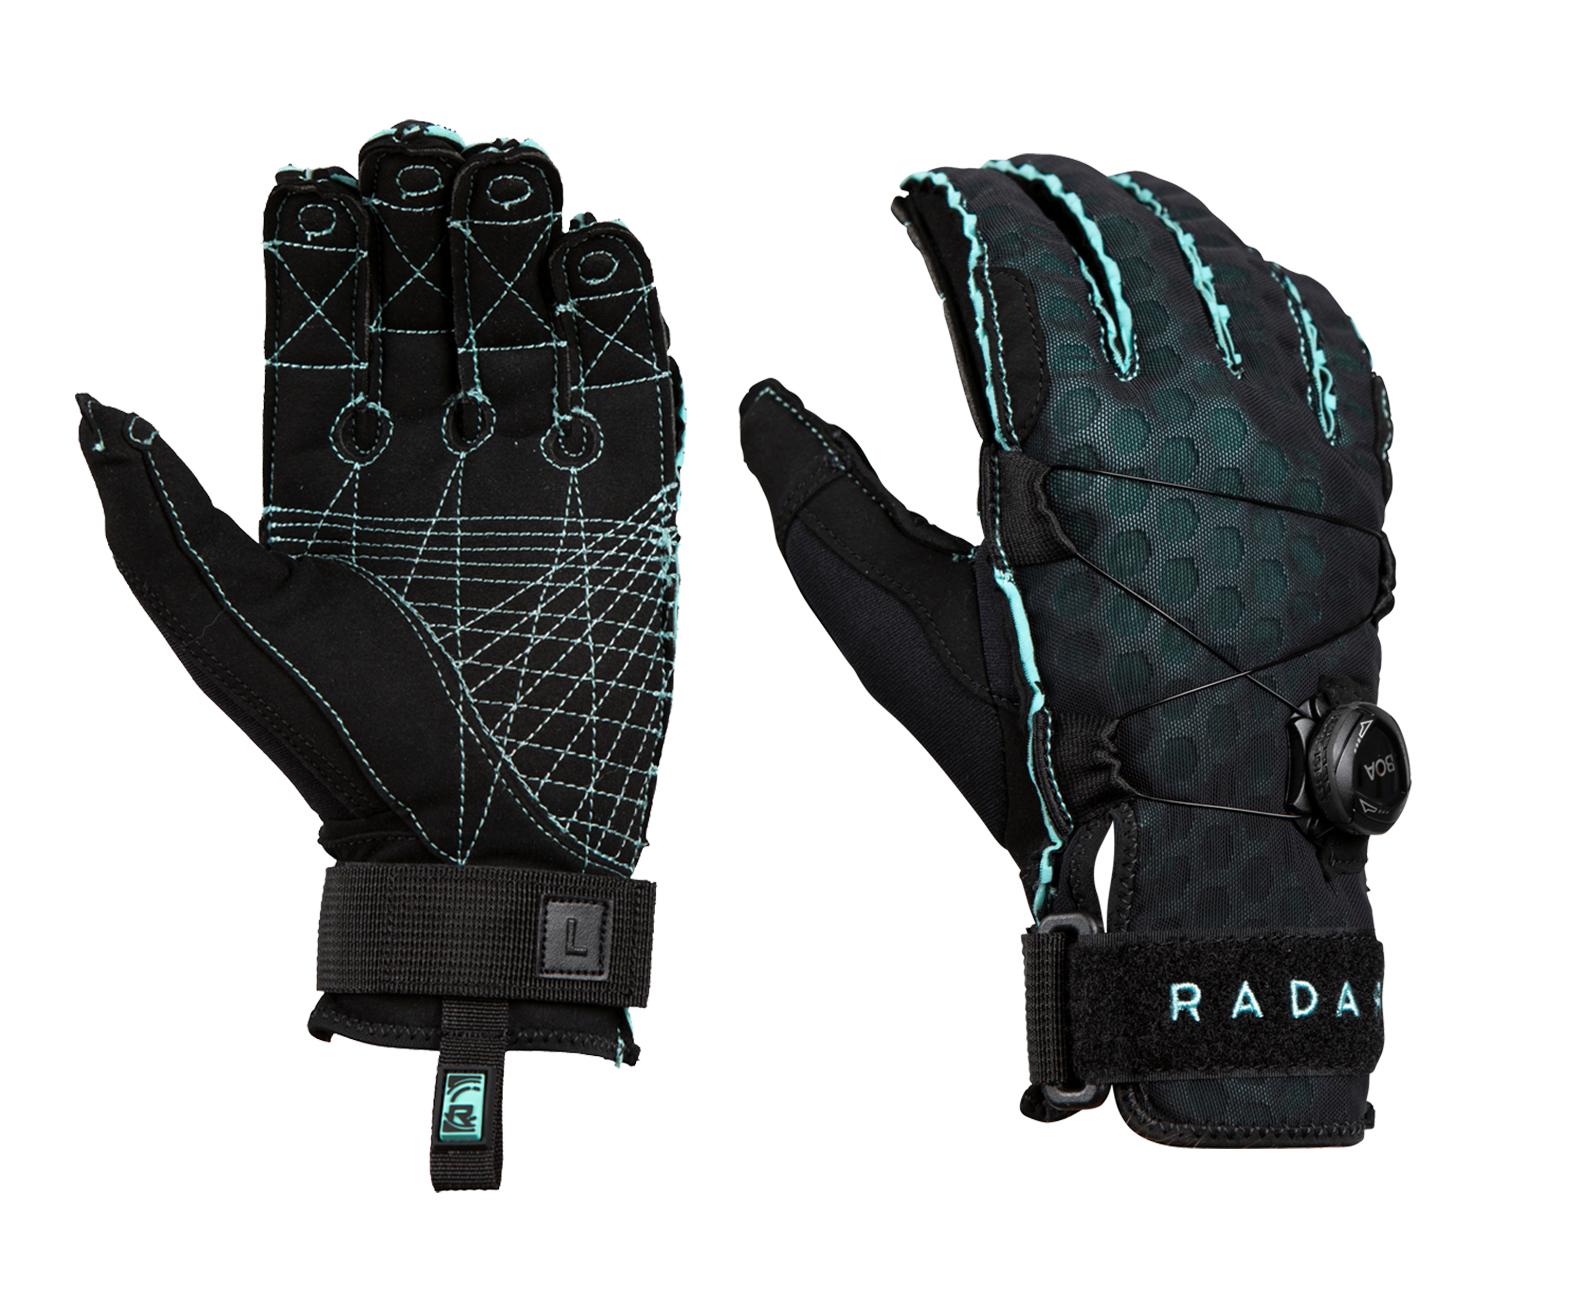 RADAR Vapor-A Boa Inside-Out Black/Mint Ariaprene Gloves (215022-par)